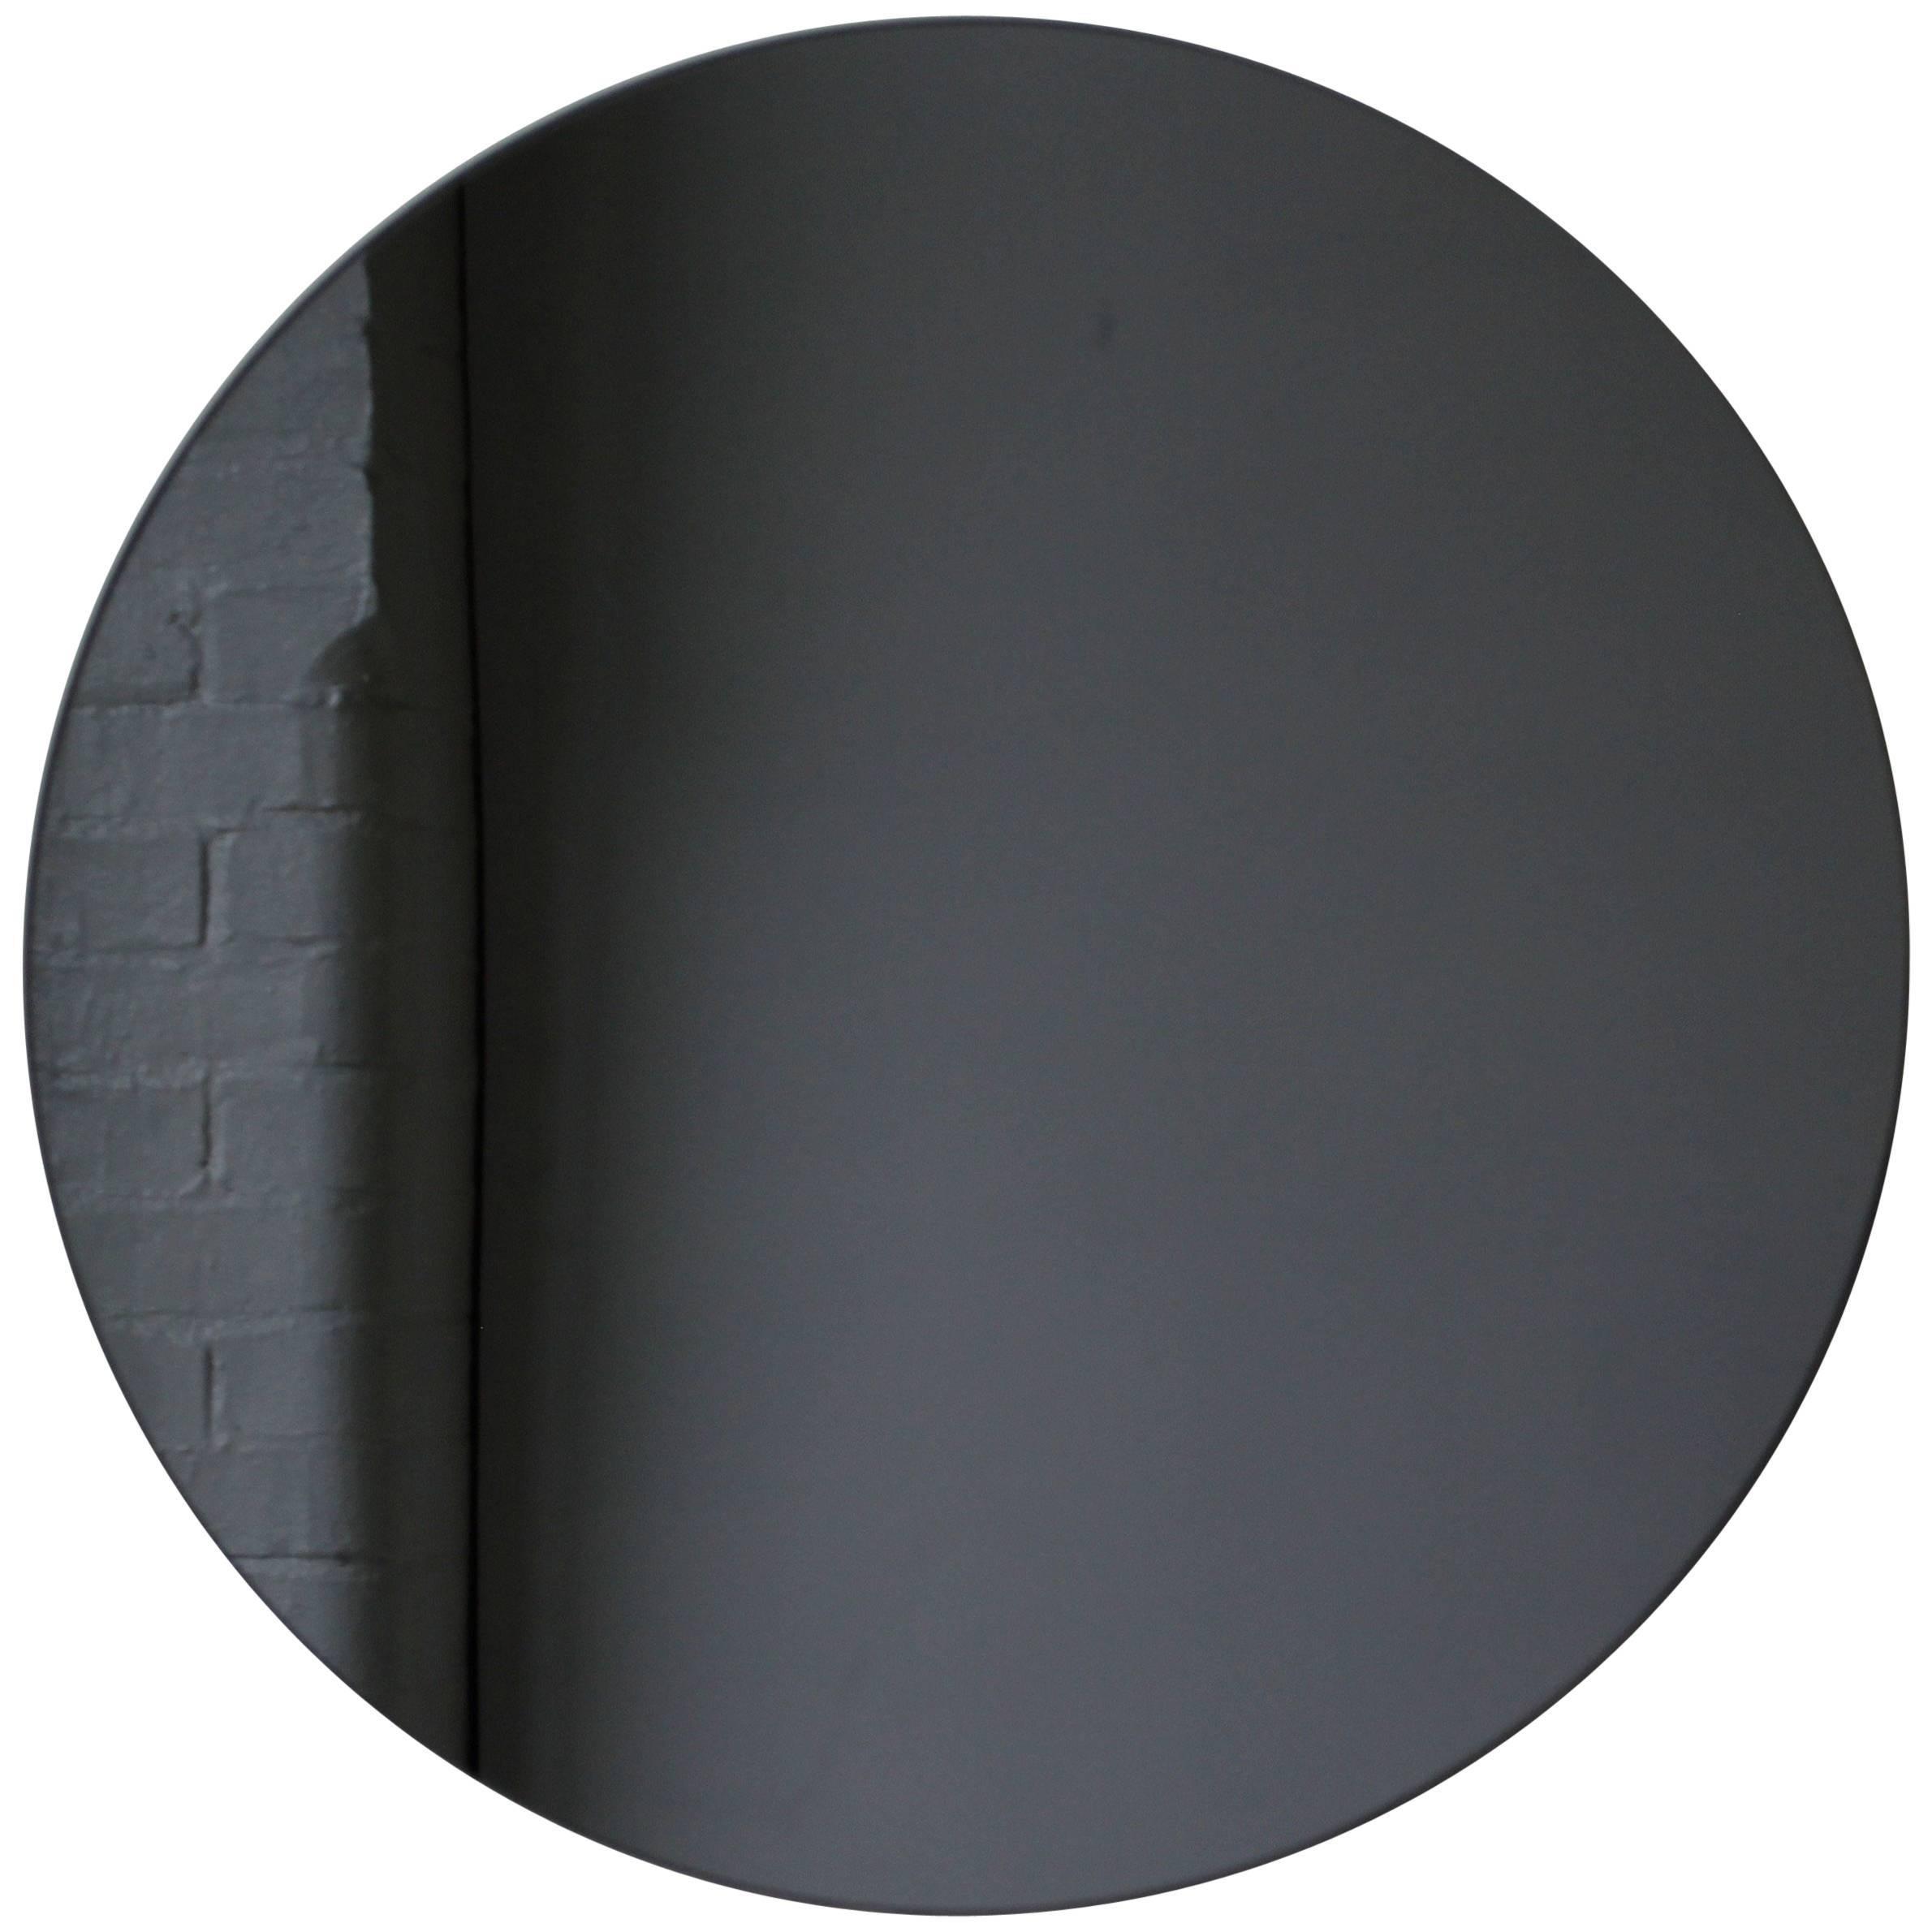 Orbis™ Black Tinted Round Frameless Contemporary Mirror - Small